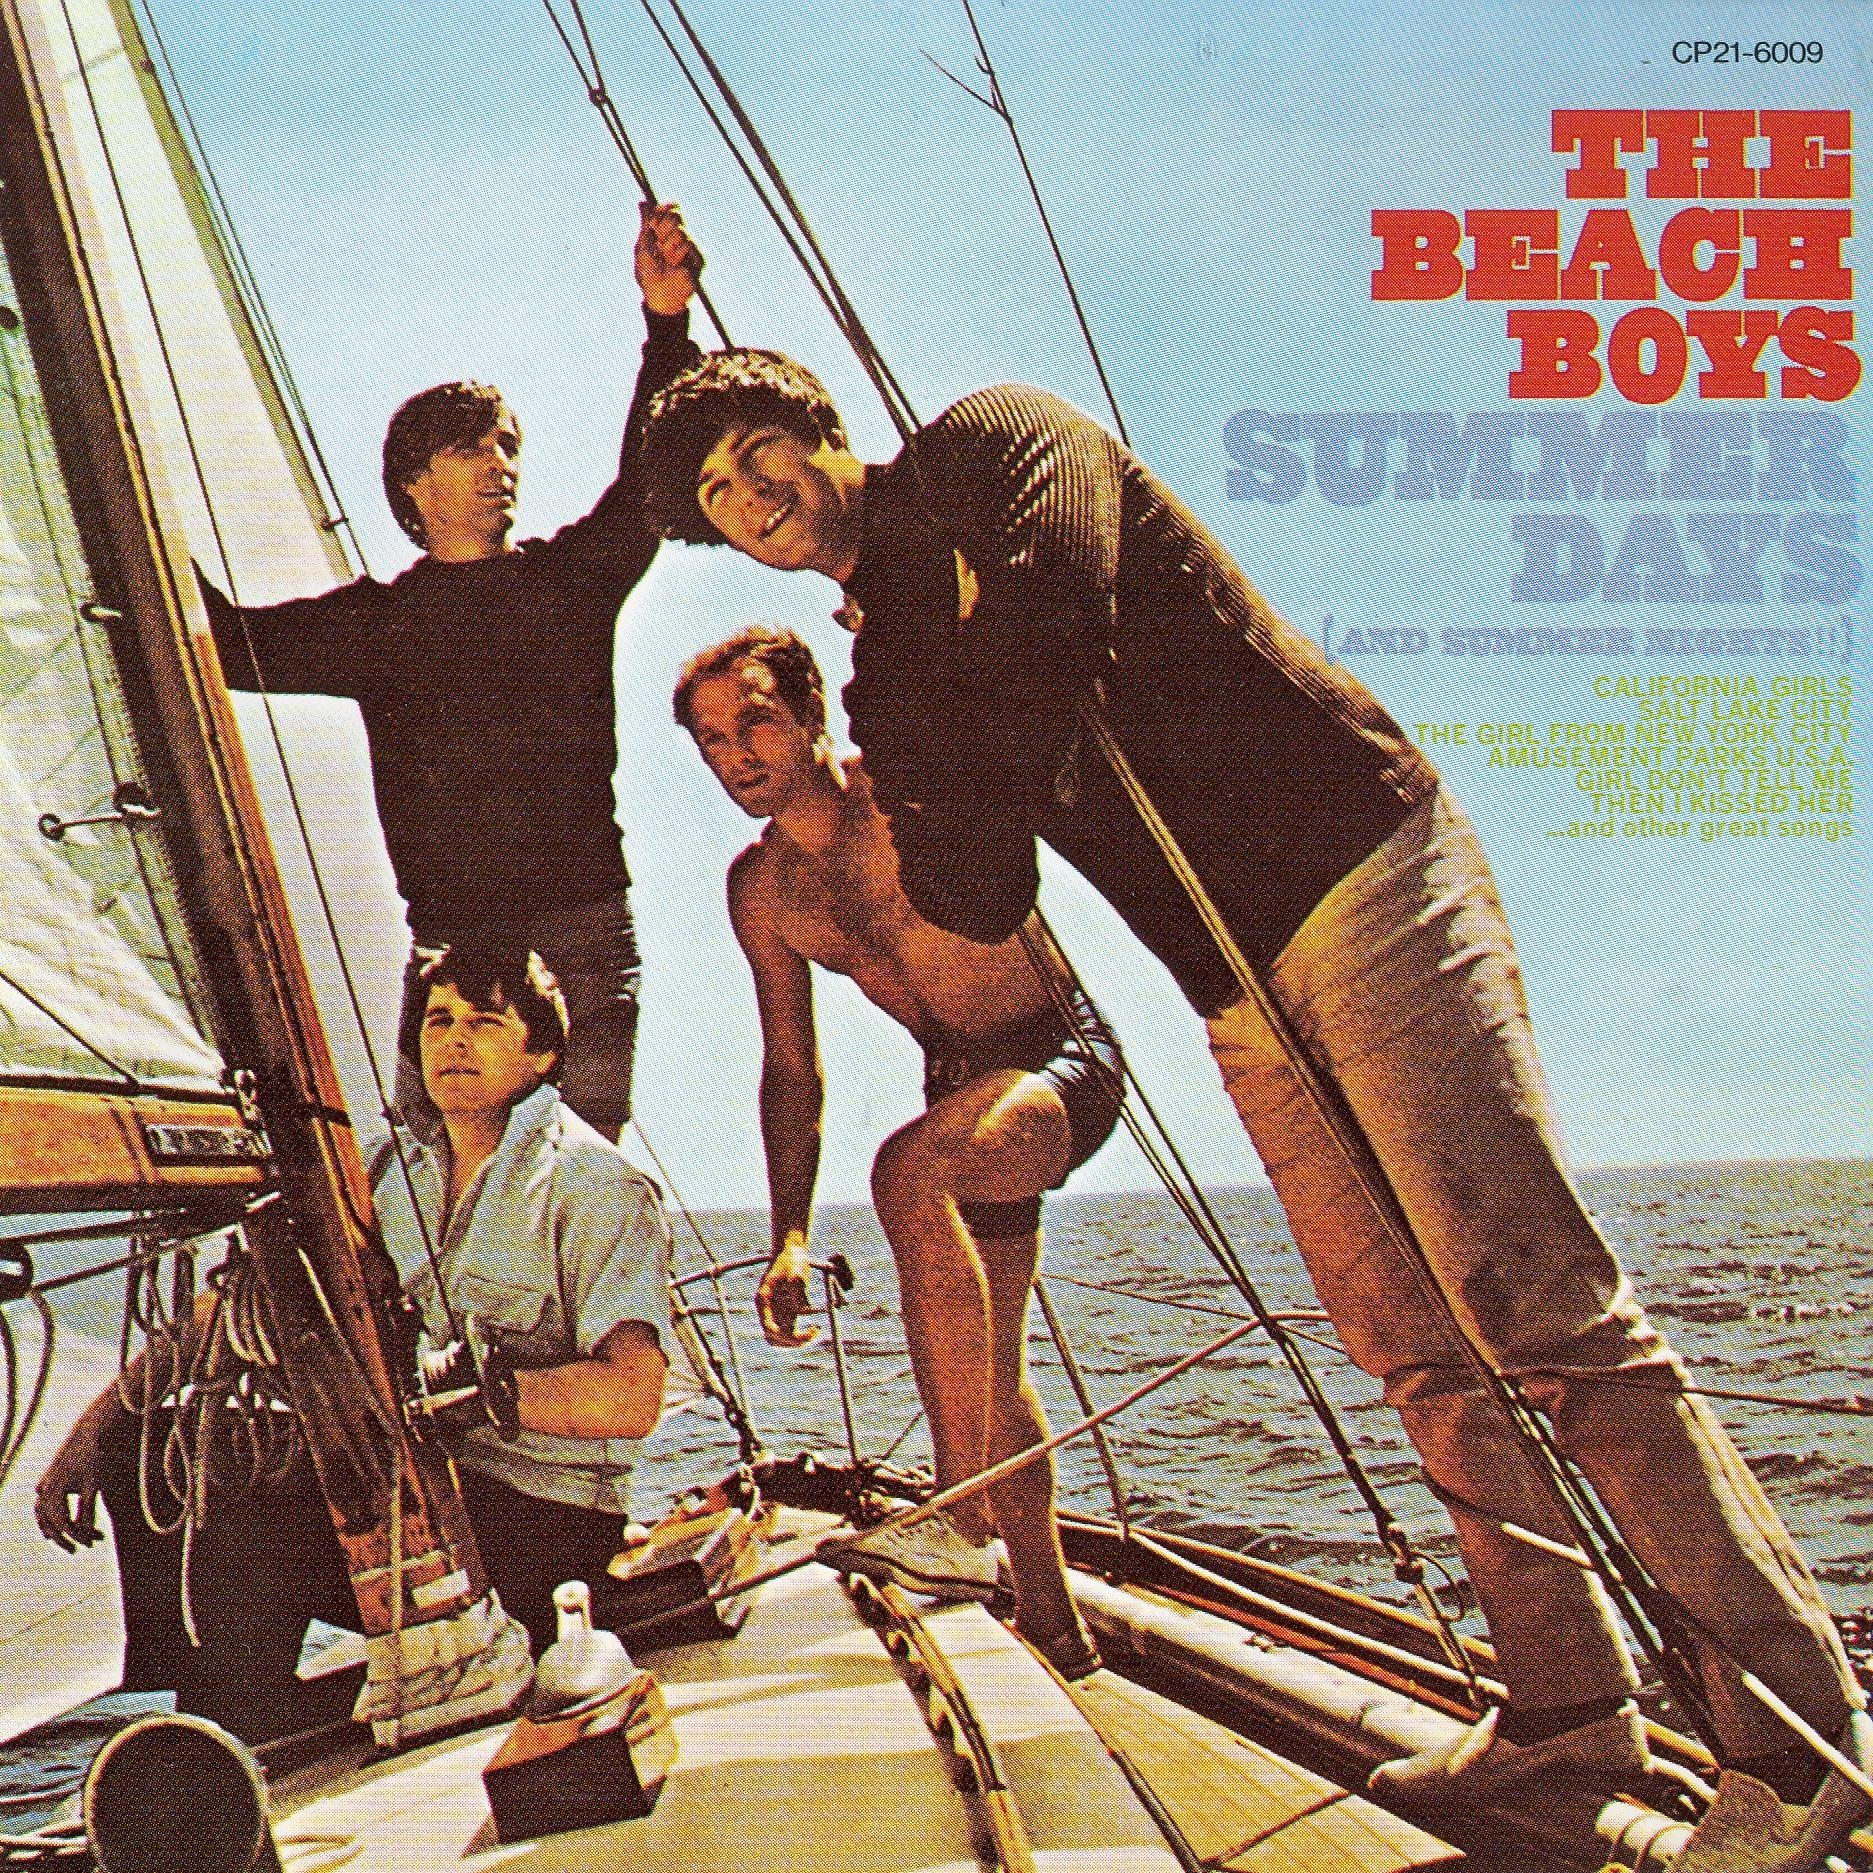 The beach boys Summer days and summer nights